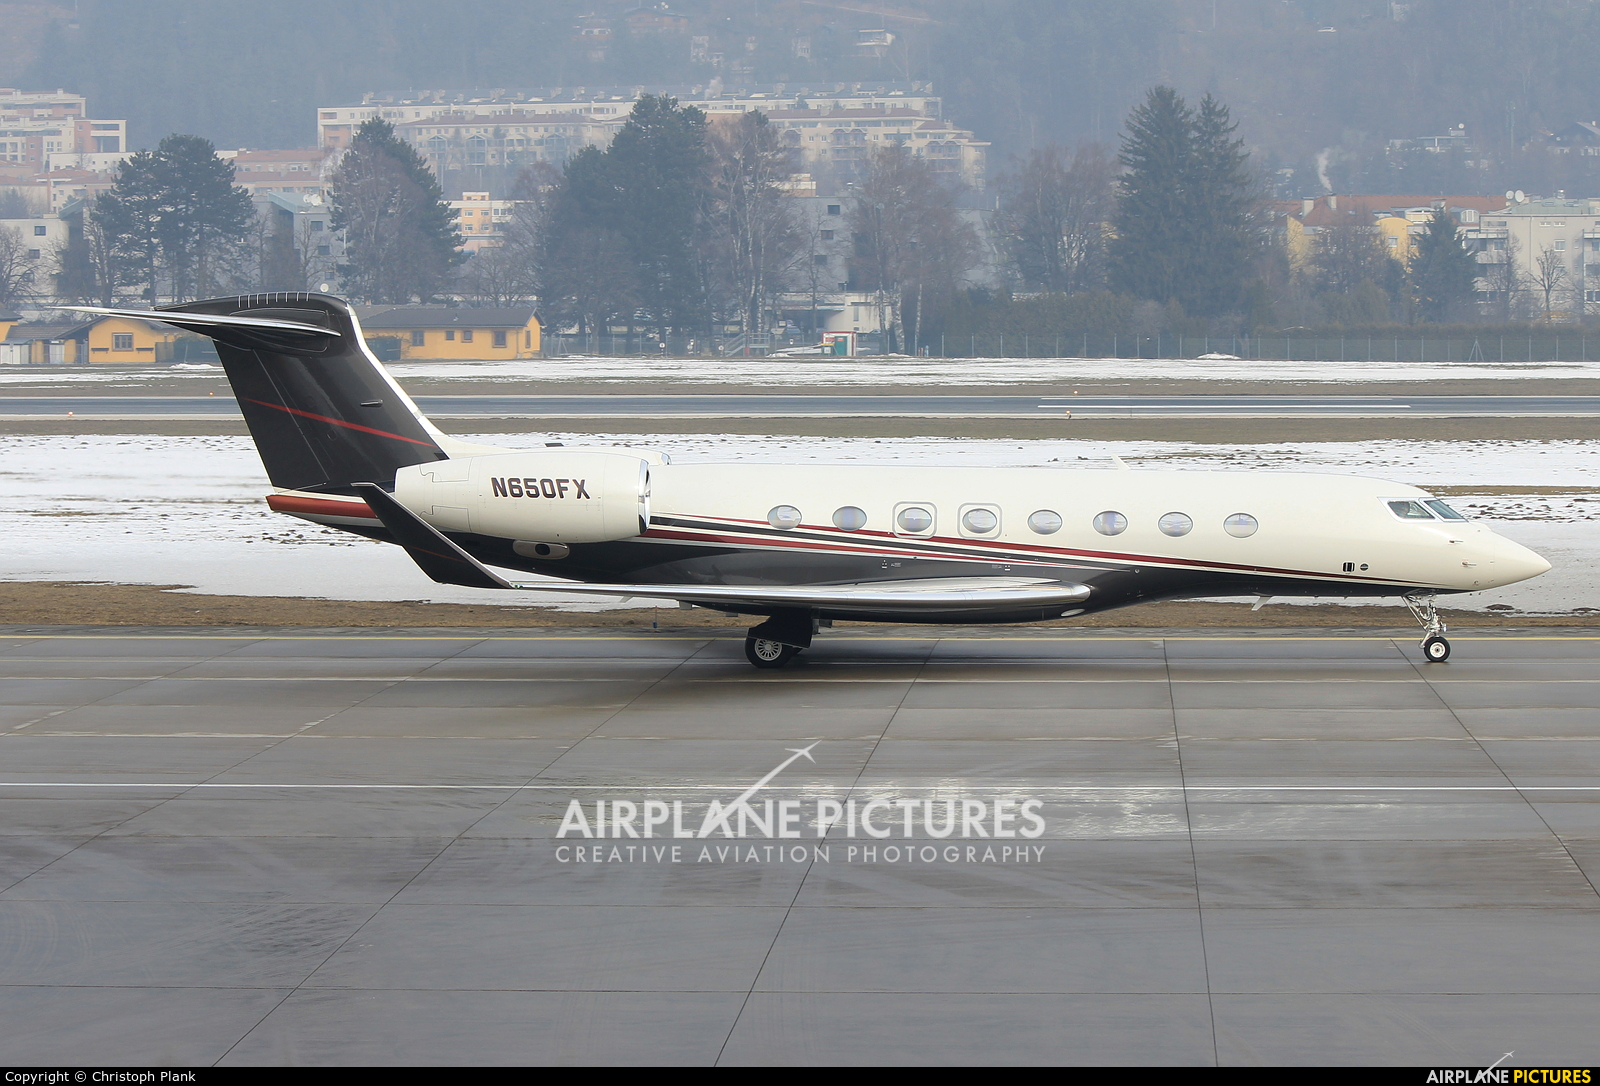 FlexJet N650FX aircraft at Innsbruck